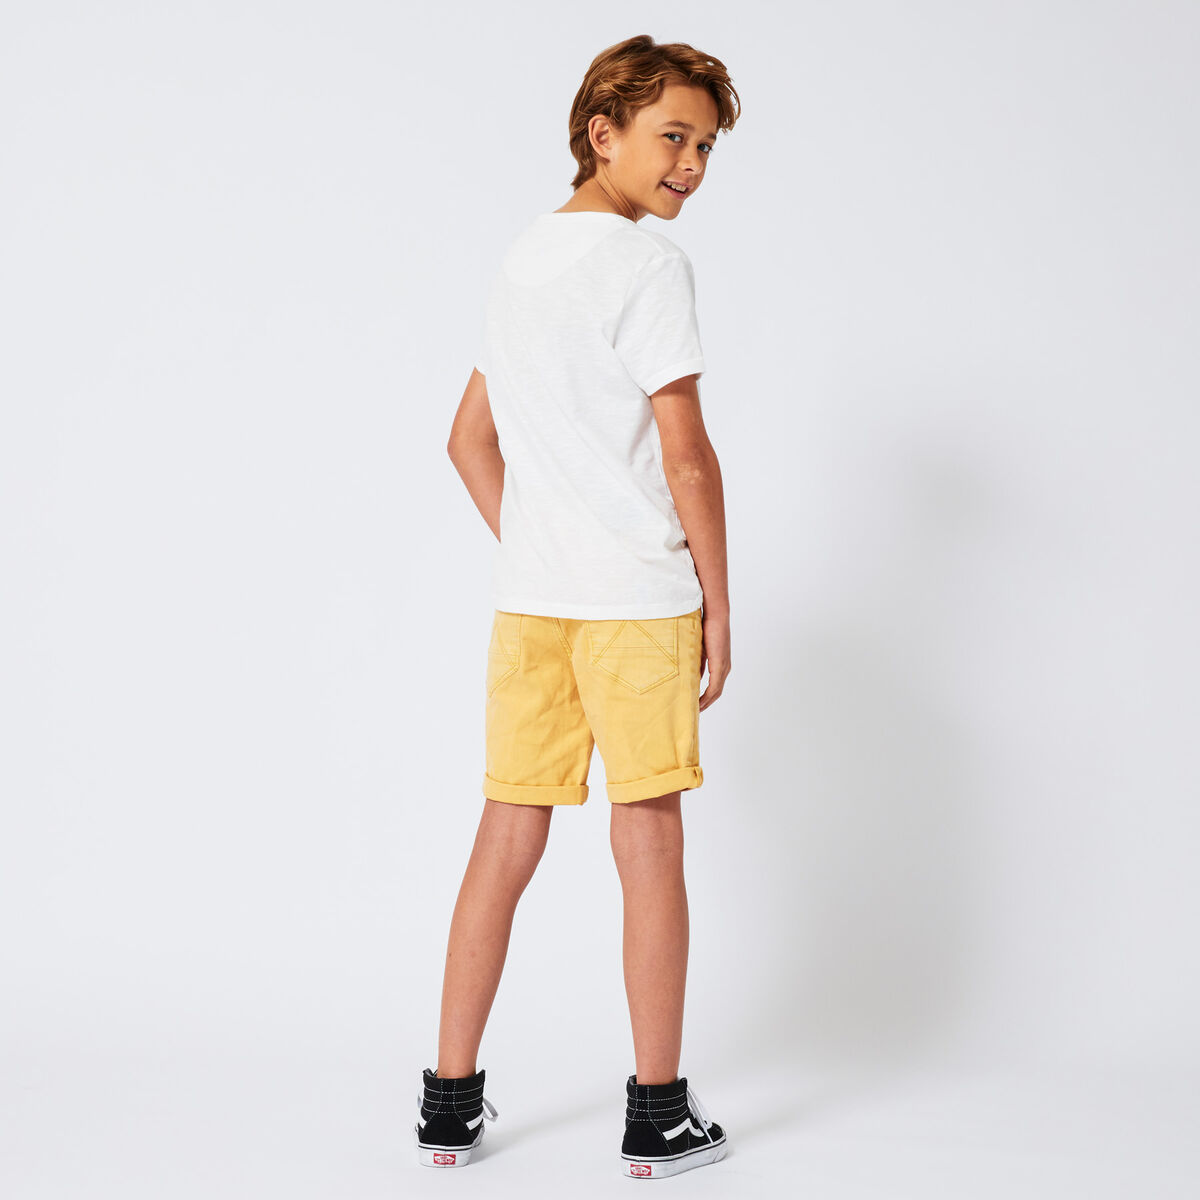 T-shirt Endrew Jr.